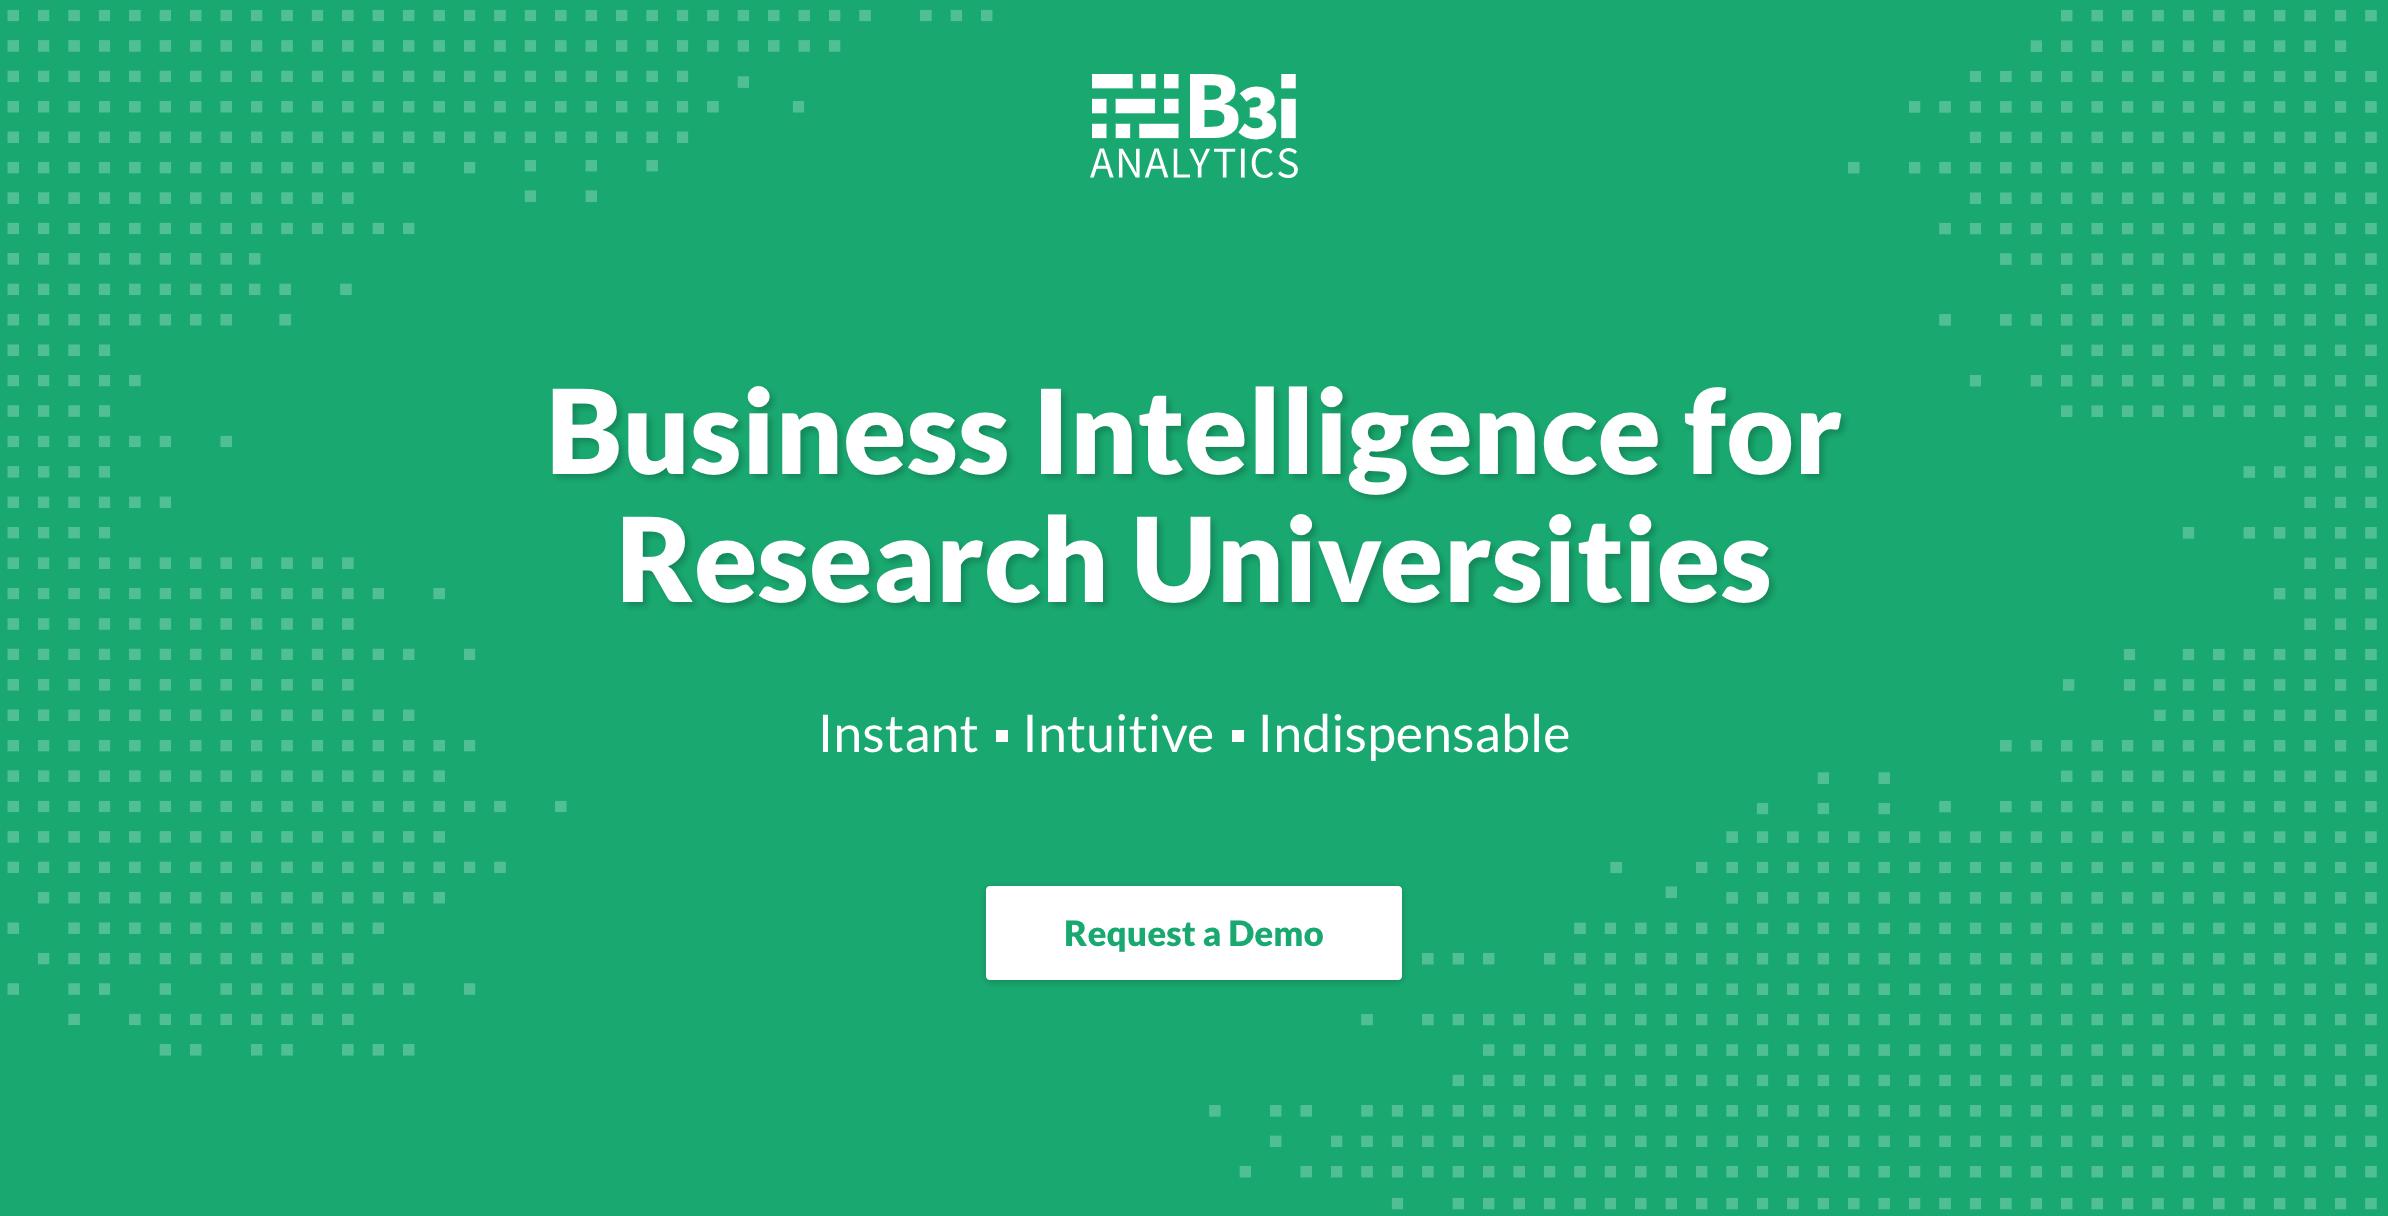 Screenshot of B3i's marketing site